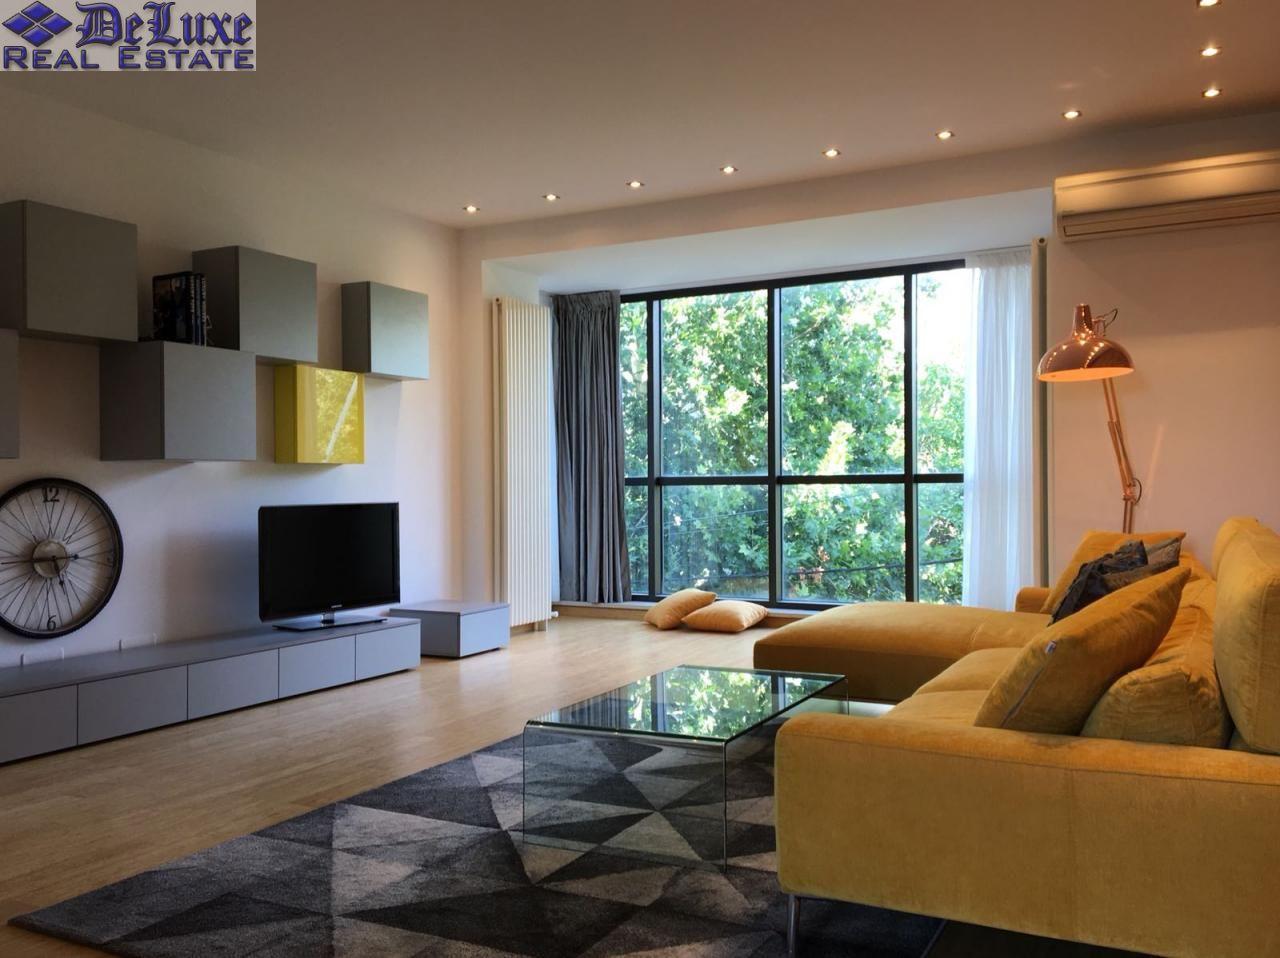 Apartament de inchiriat, București (judet), Francez - Foto 3